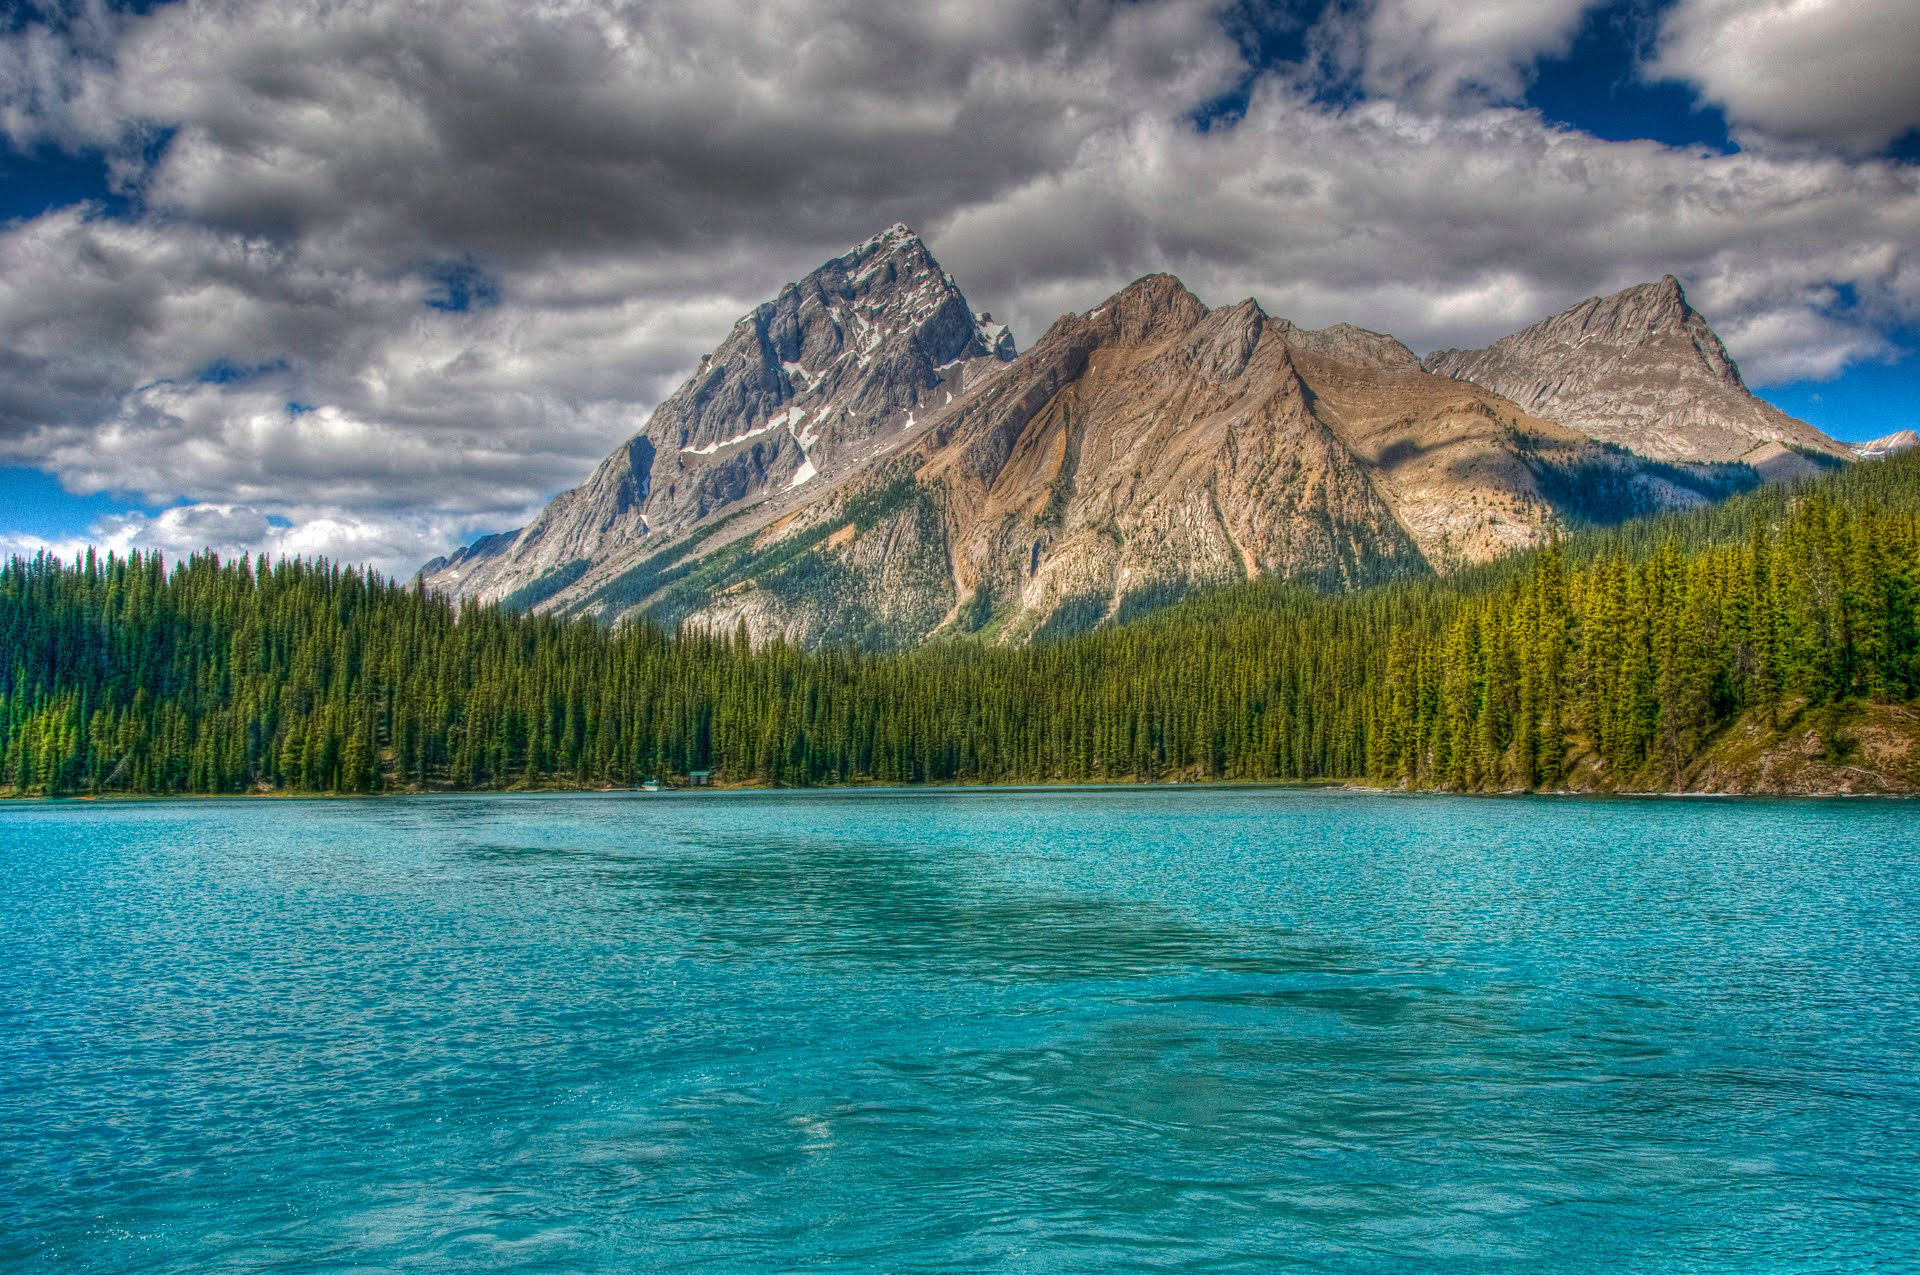 канада пейзаж обои на рабочий стол № 567425 без смс